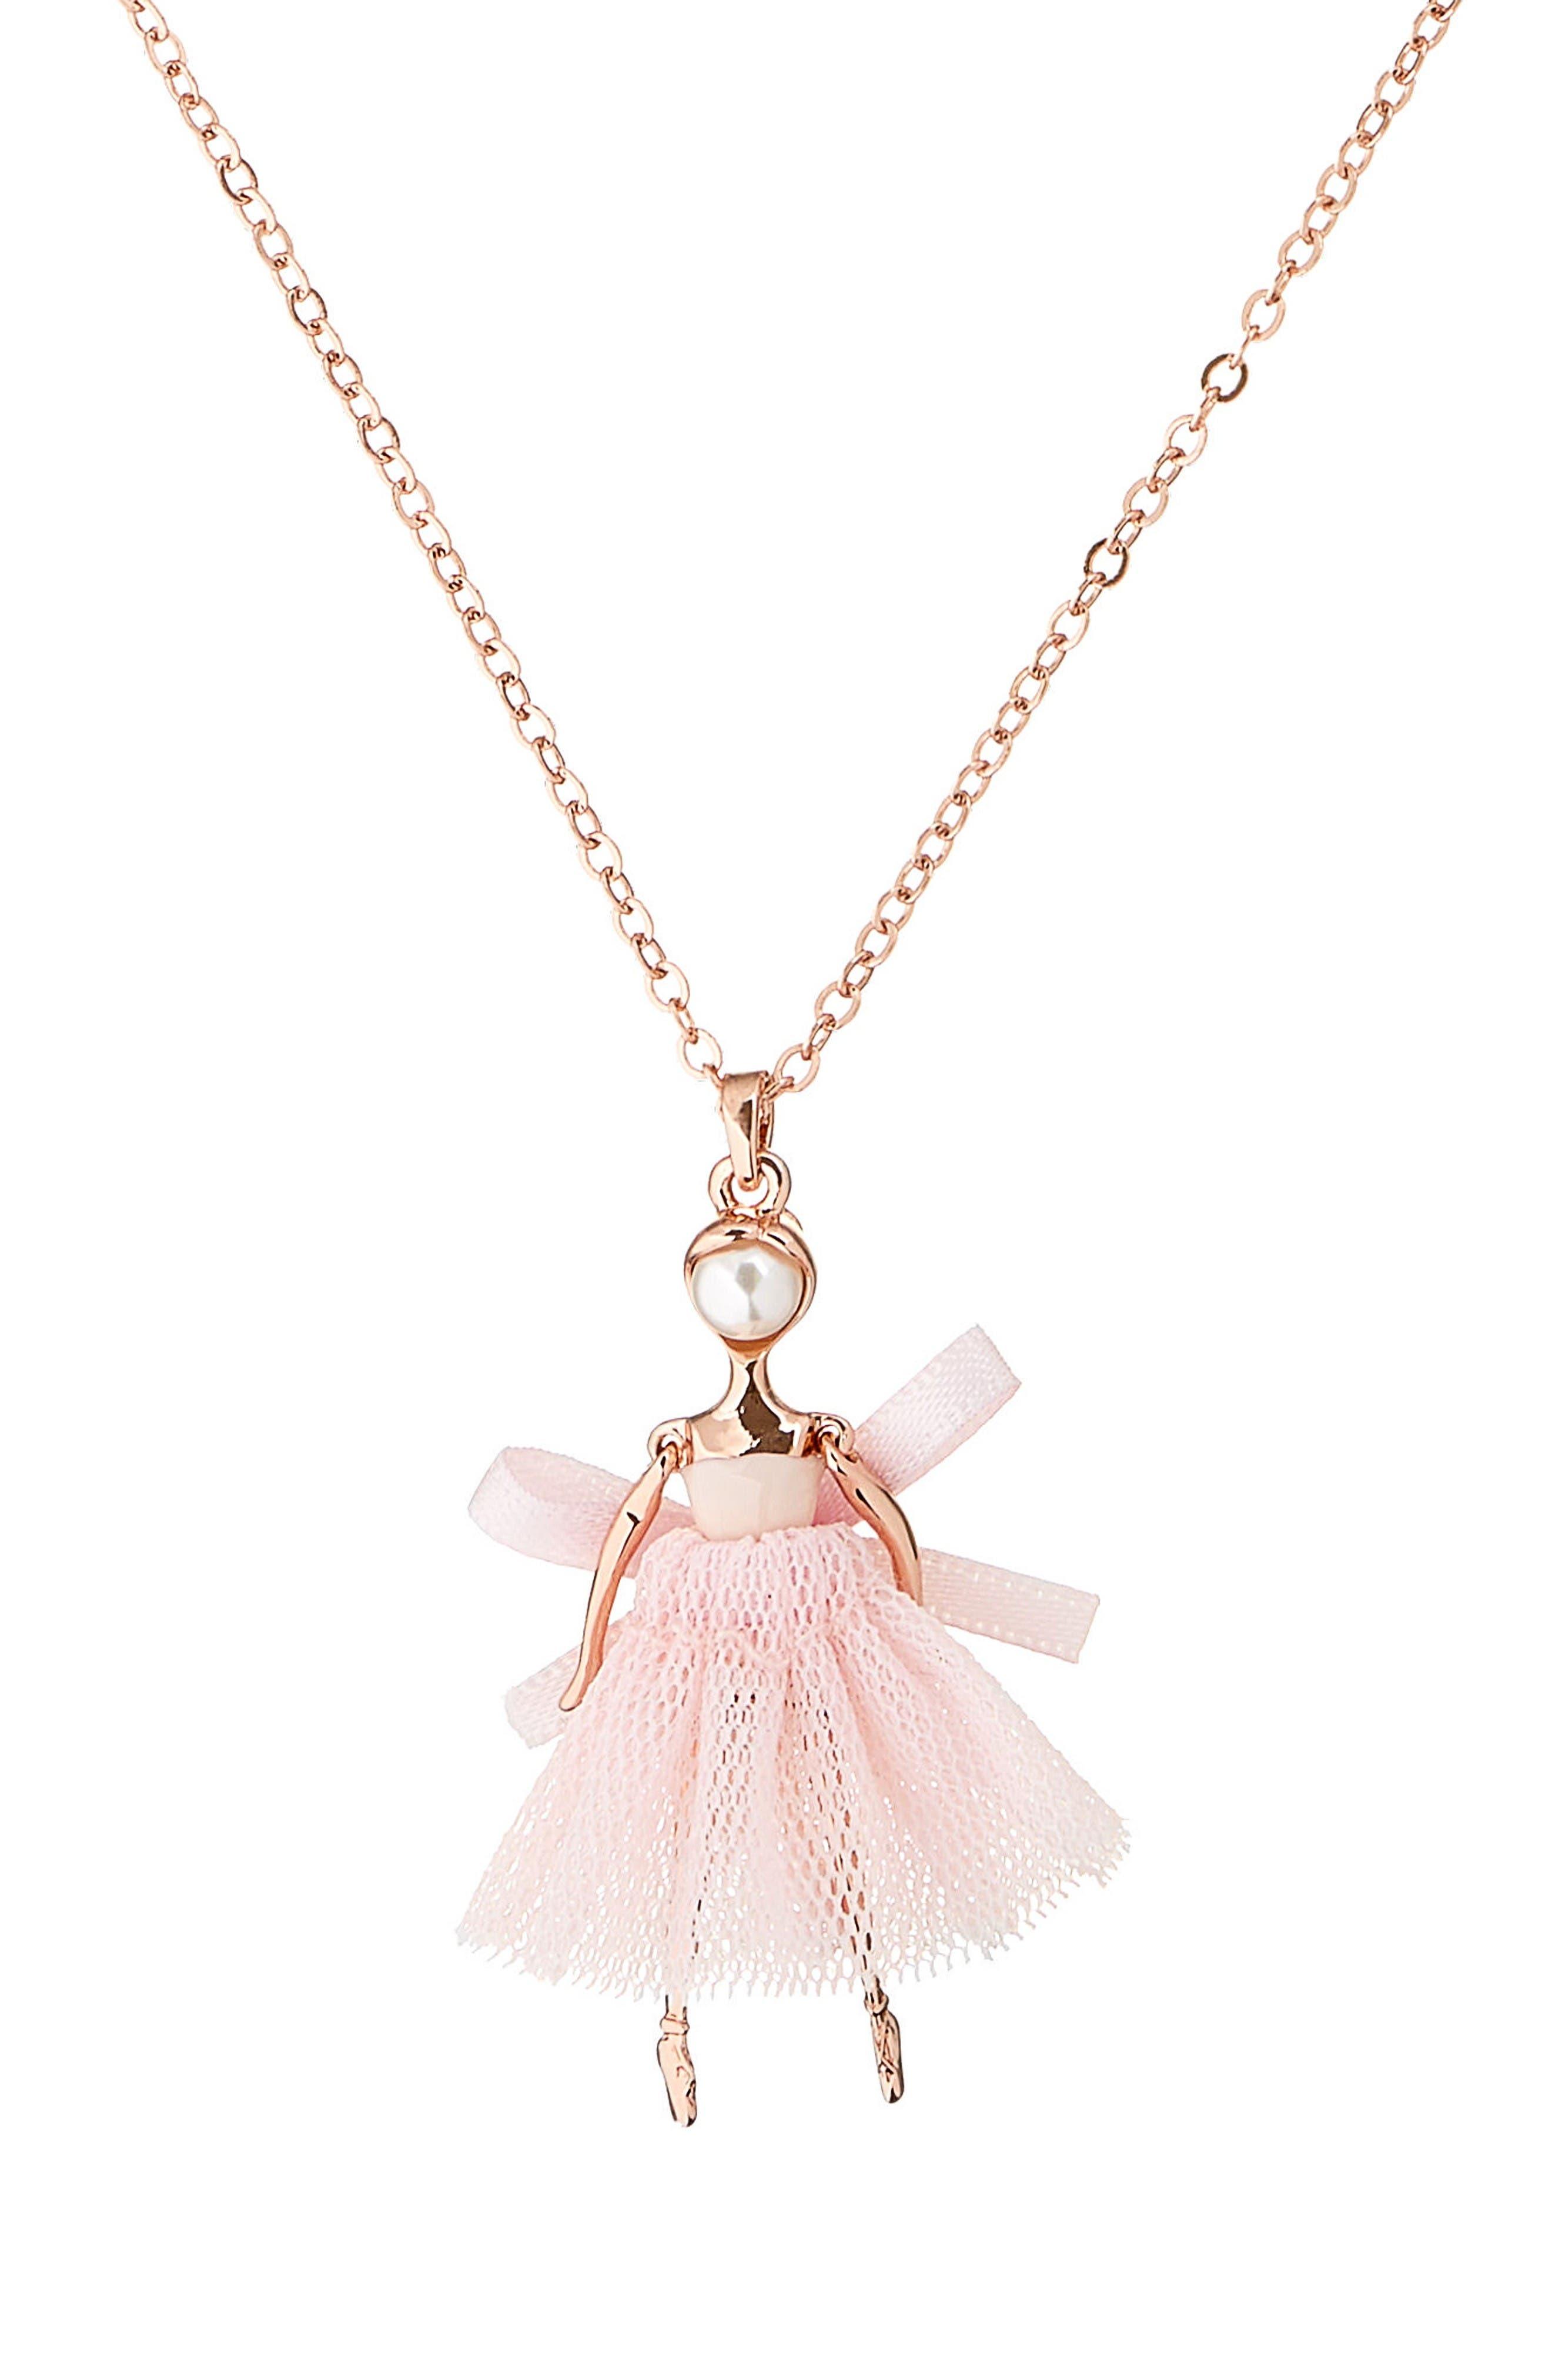 Carabel Ballerina Pendant Necklace,                             Alternate thumbnail 2, color,                             Nude Pink